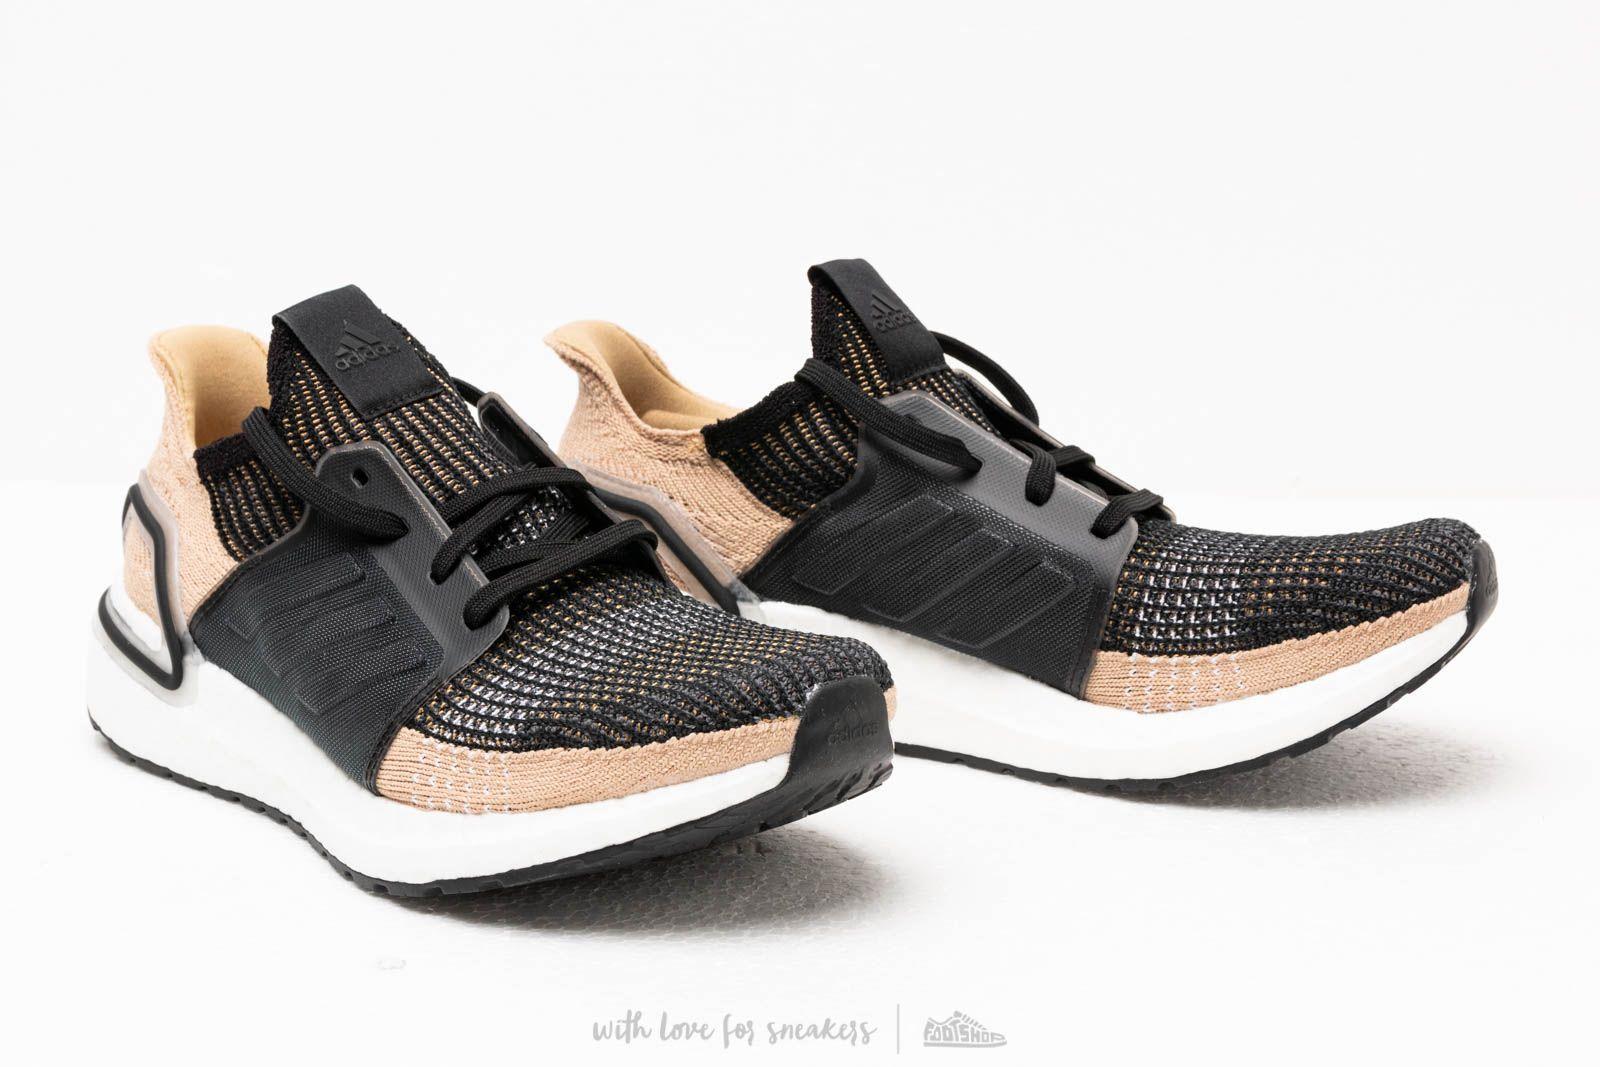 bb7acbaa9 ... Adidas Ultraboost 19 Core Black  Raw Sand  Grey Six for Men. View  fullscreen